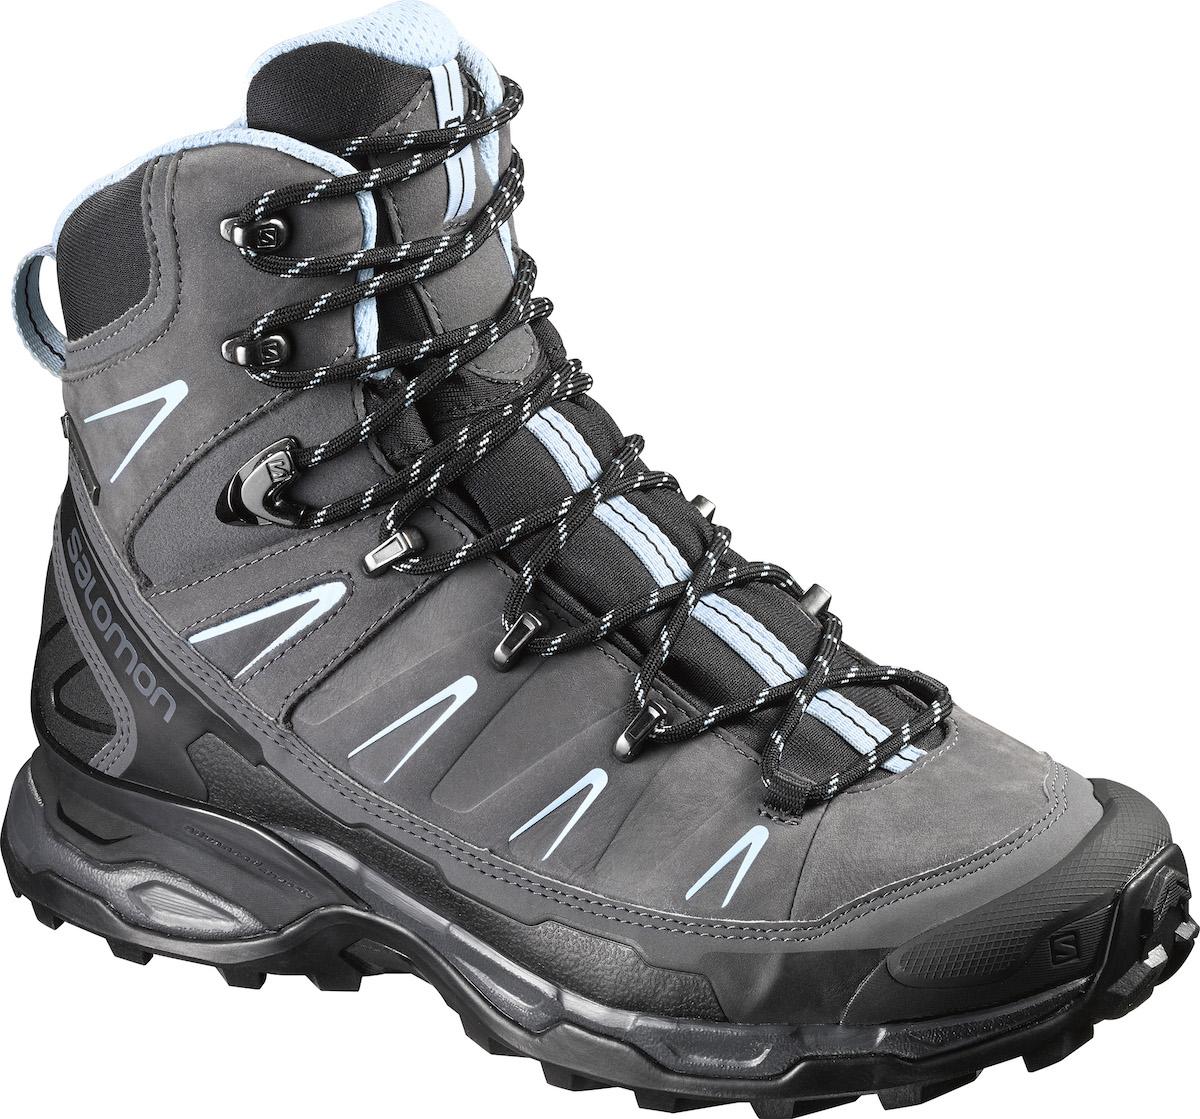 Salomon - X Ultra Trek GTX® W - Botas de trekking - Mujer